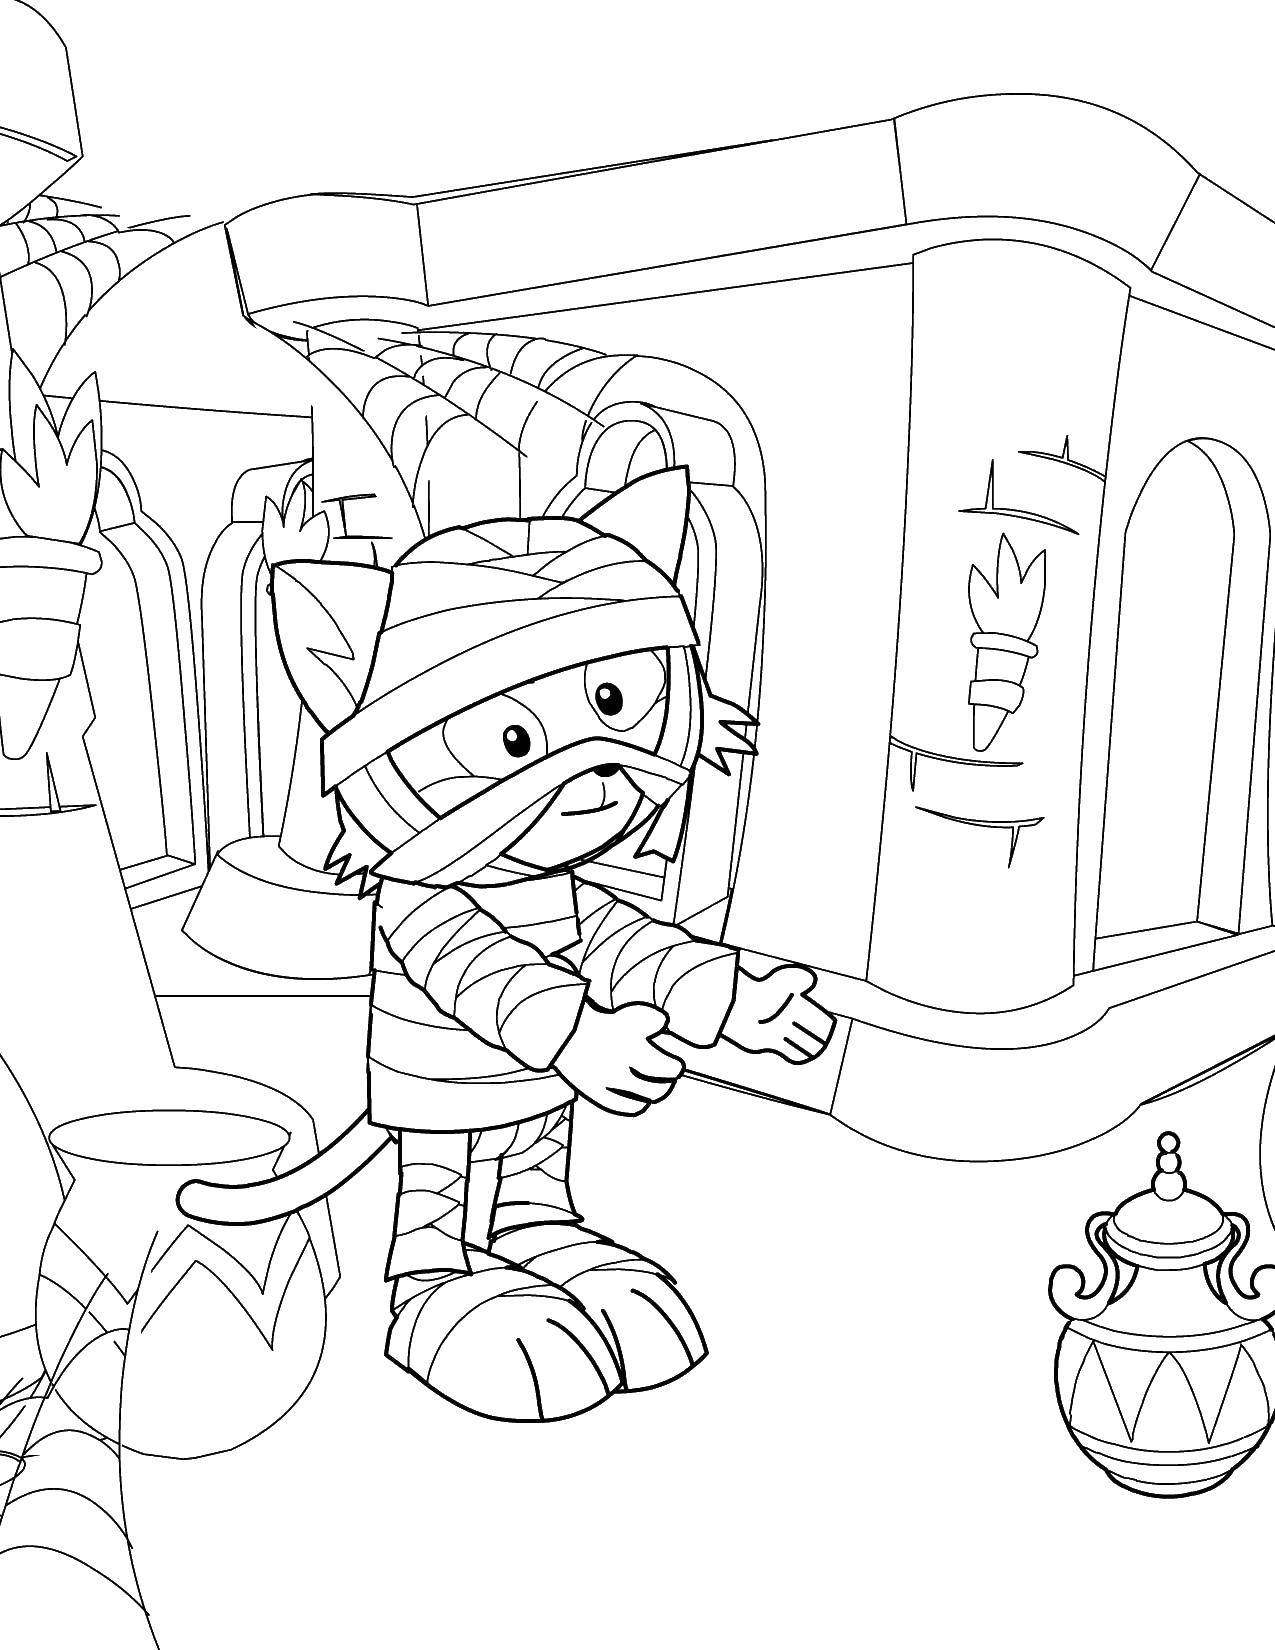 Раскраска Кот мумия. Скачать Мумия.  Распечатать ,Мумия,